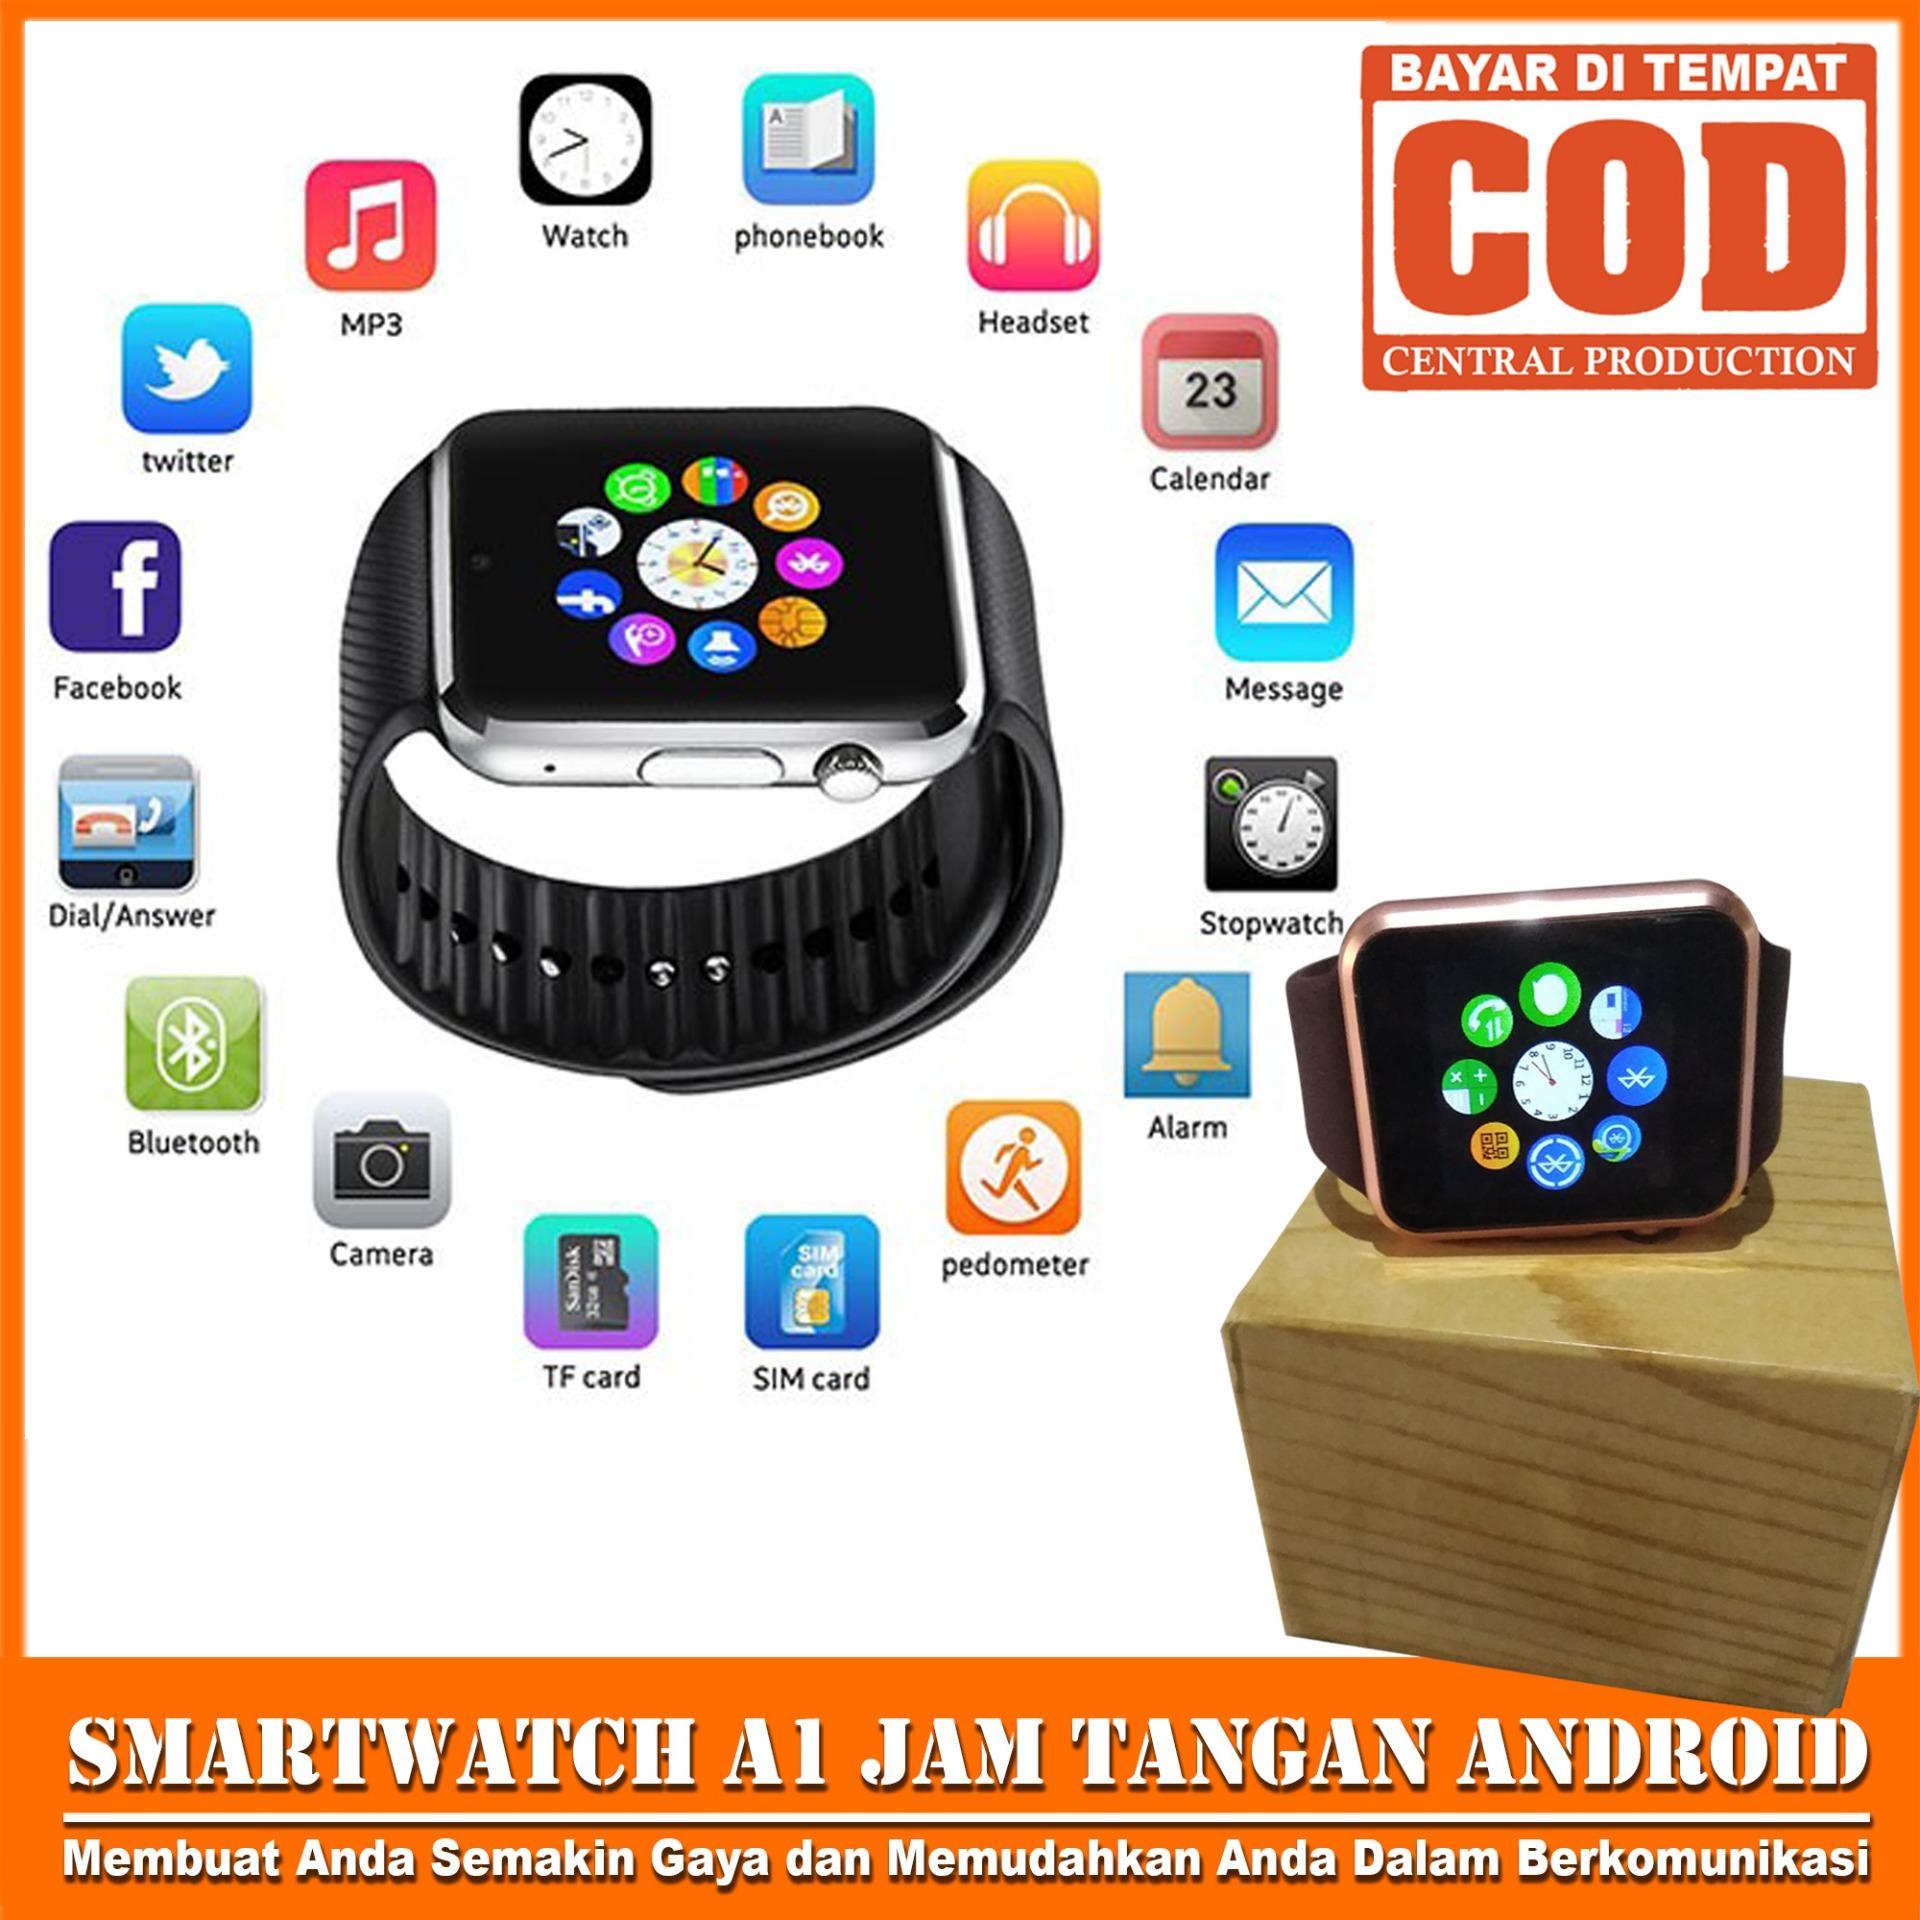 SKY Jam Tangan iwatch U10 / A1 REAL PICTURE Smart Watch Touch Screen + GSM Smartwatch Gear/Support Sim Card dan Memori Card